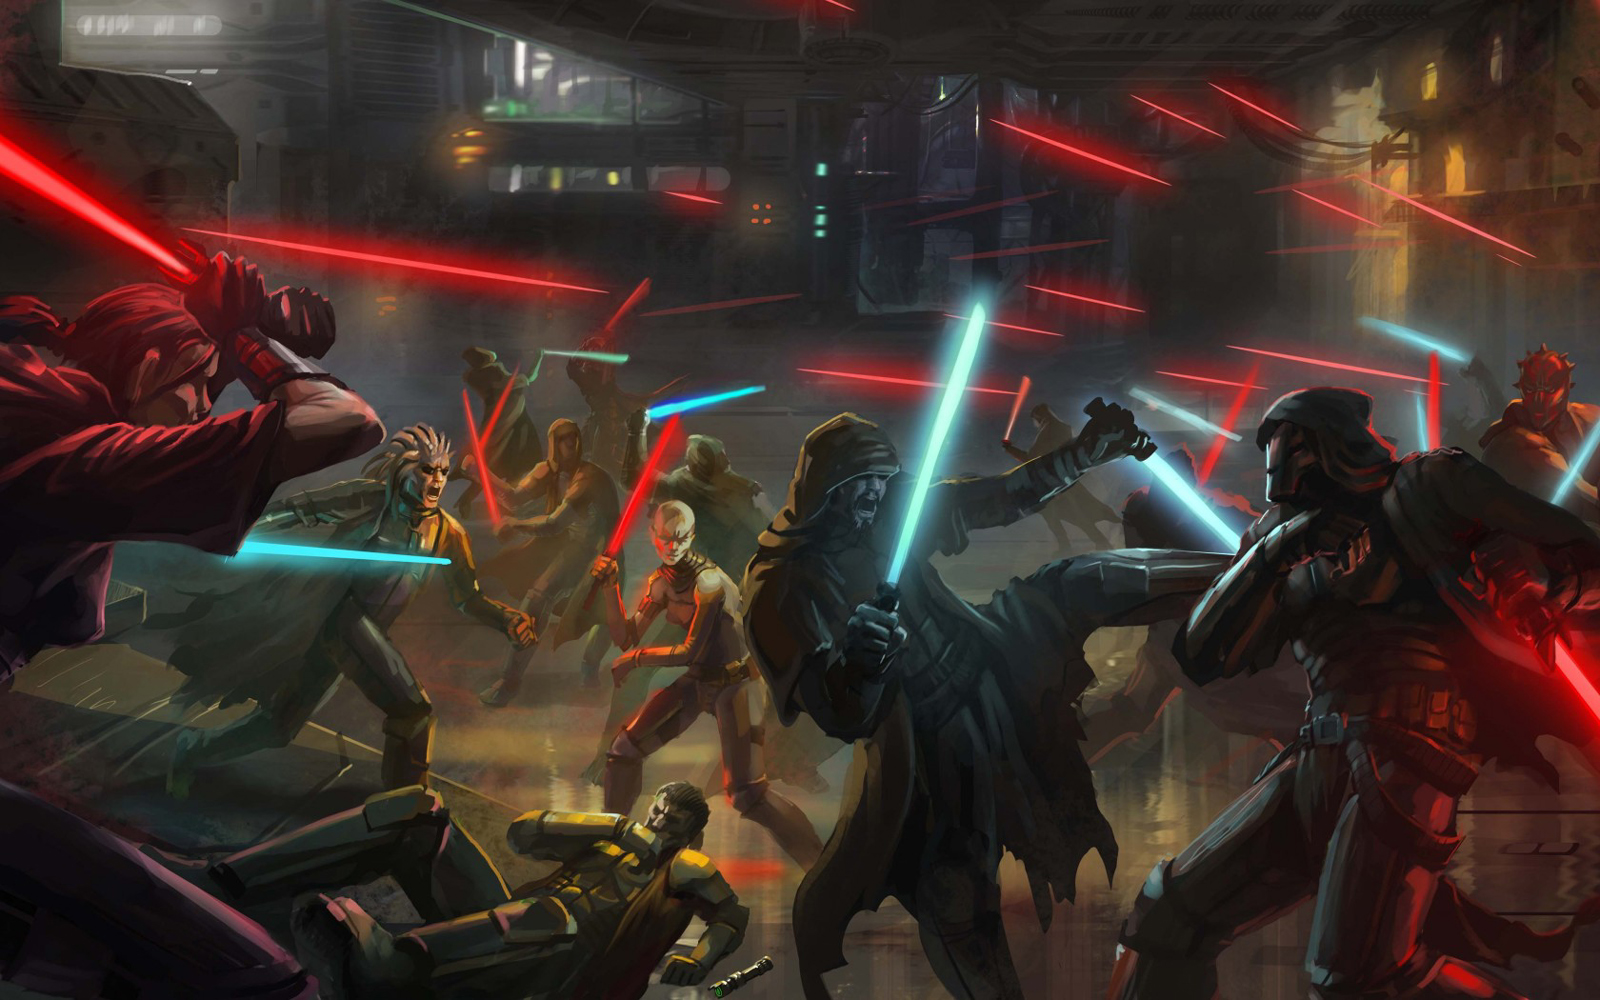 Free Download Star Wars Knights Of The Old Republic Hd Desktop